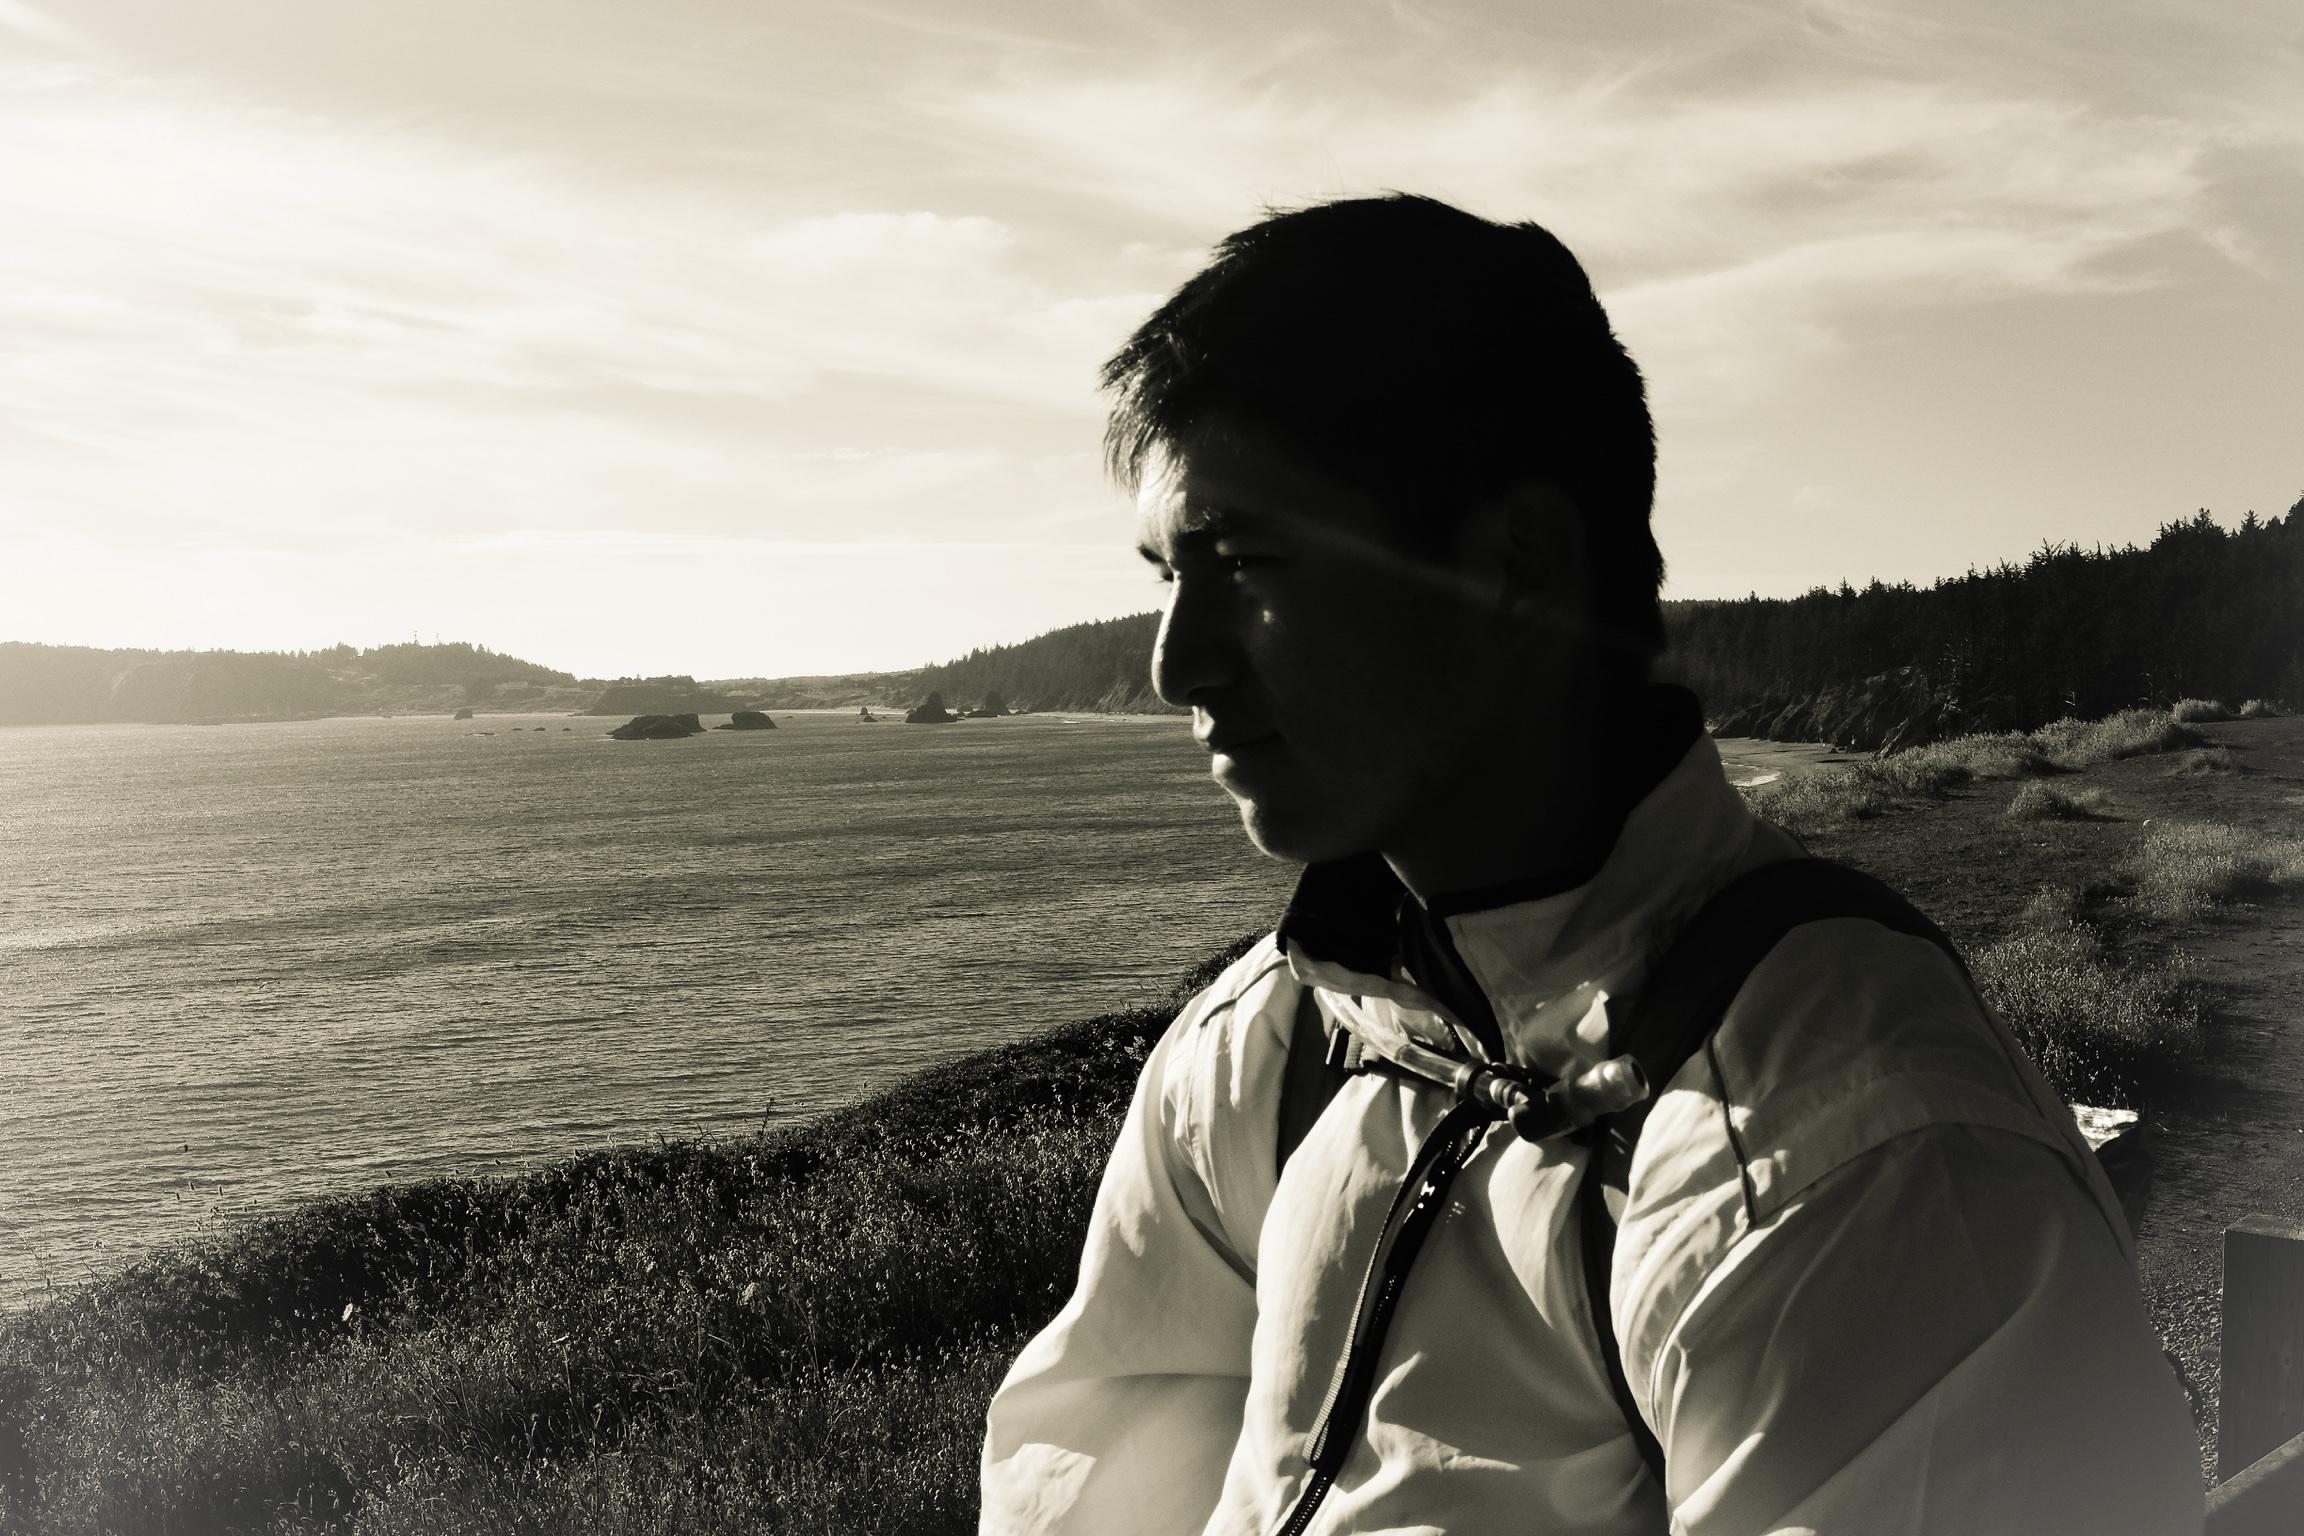 Josh in thought-.jpg